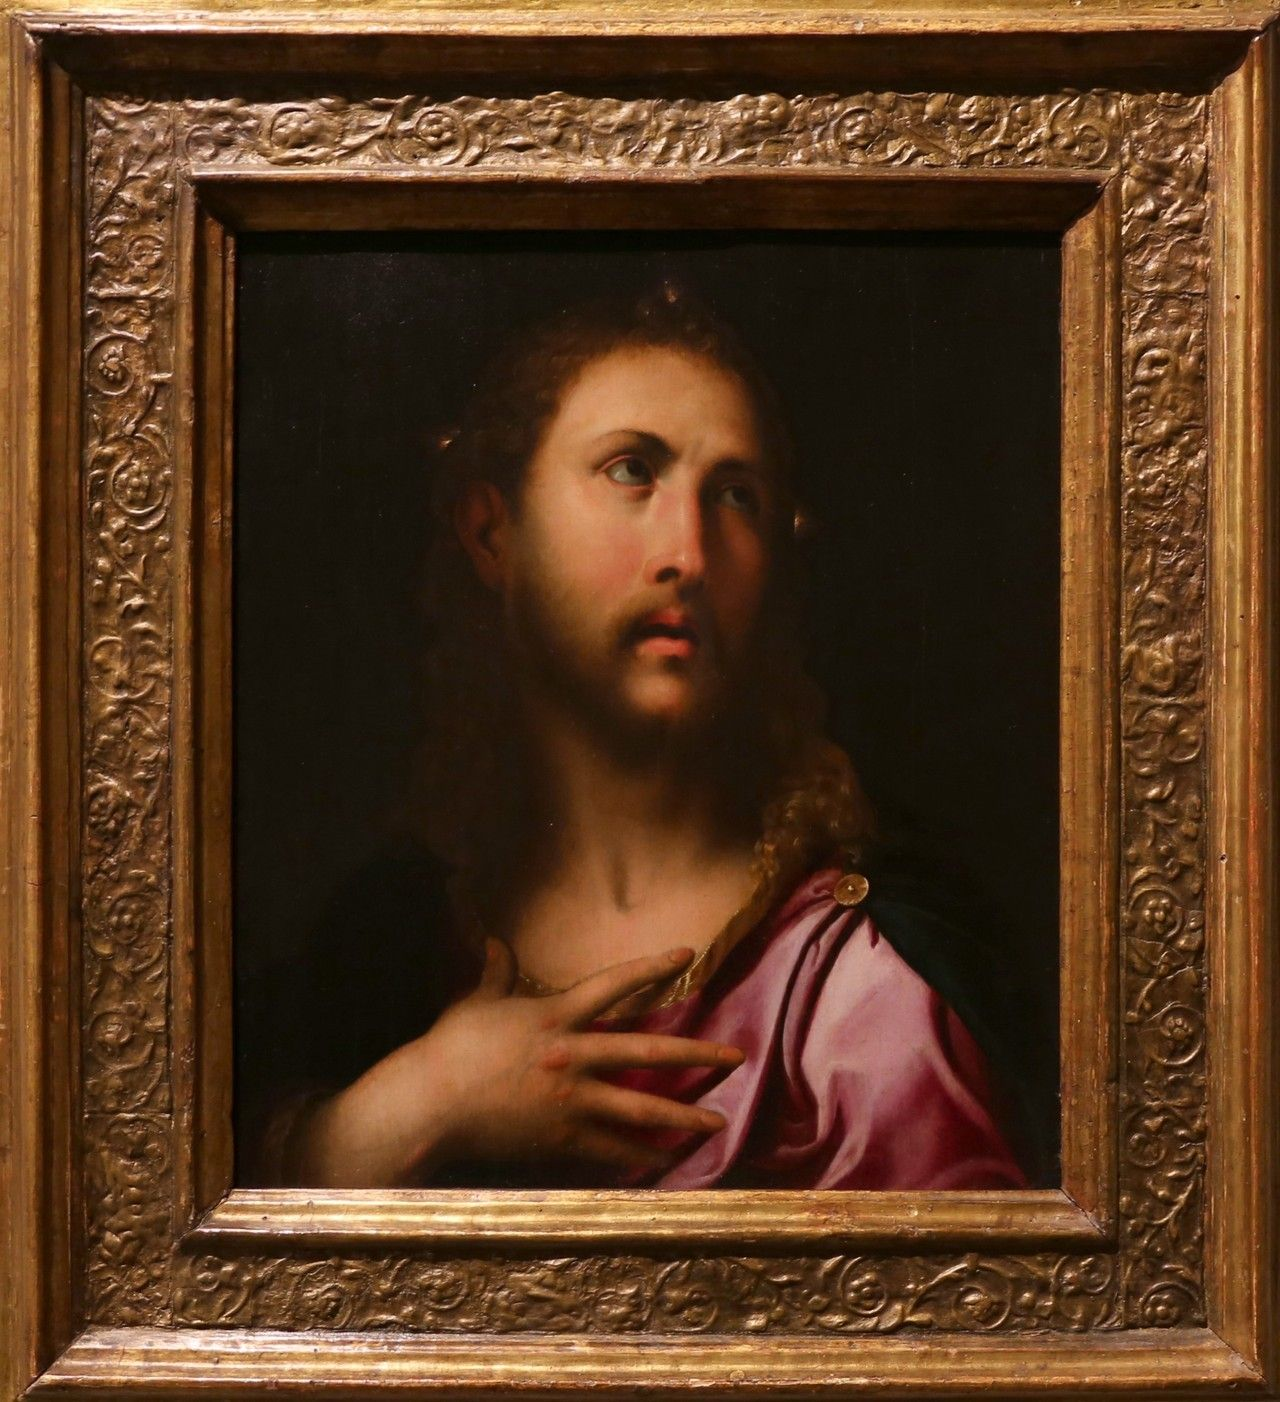 Antonio Campi Christ. 1550 Arte sacro, Imágenes